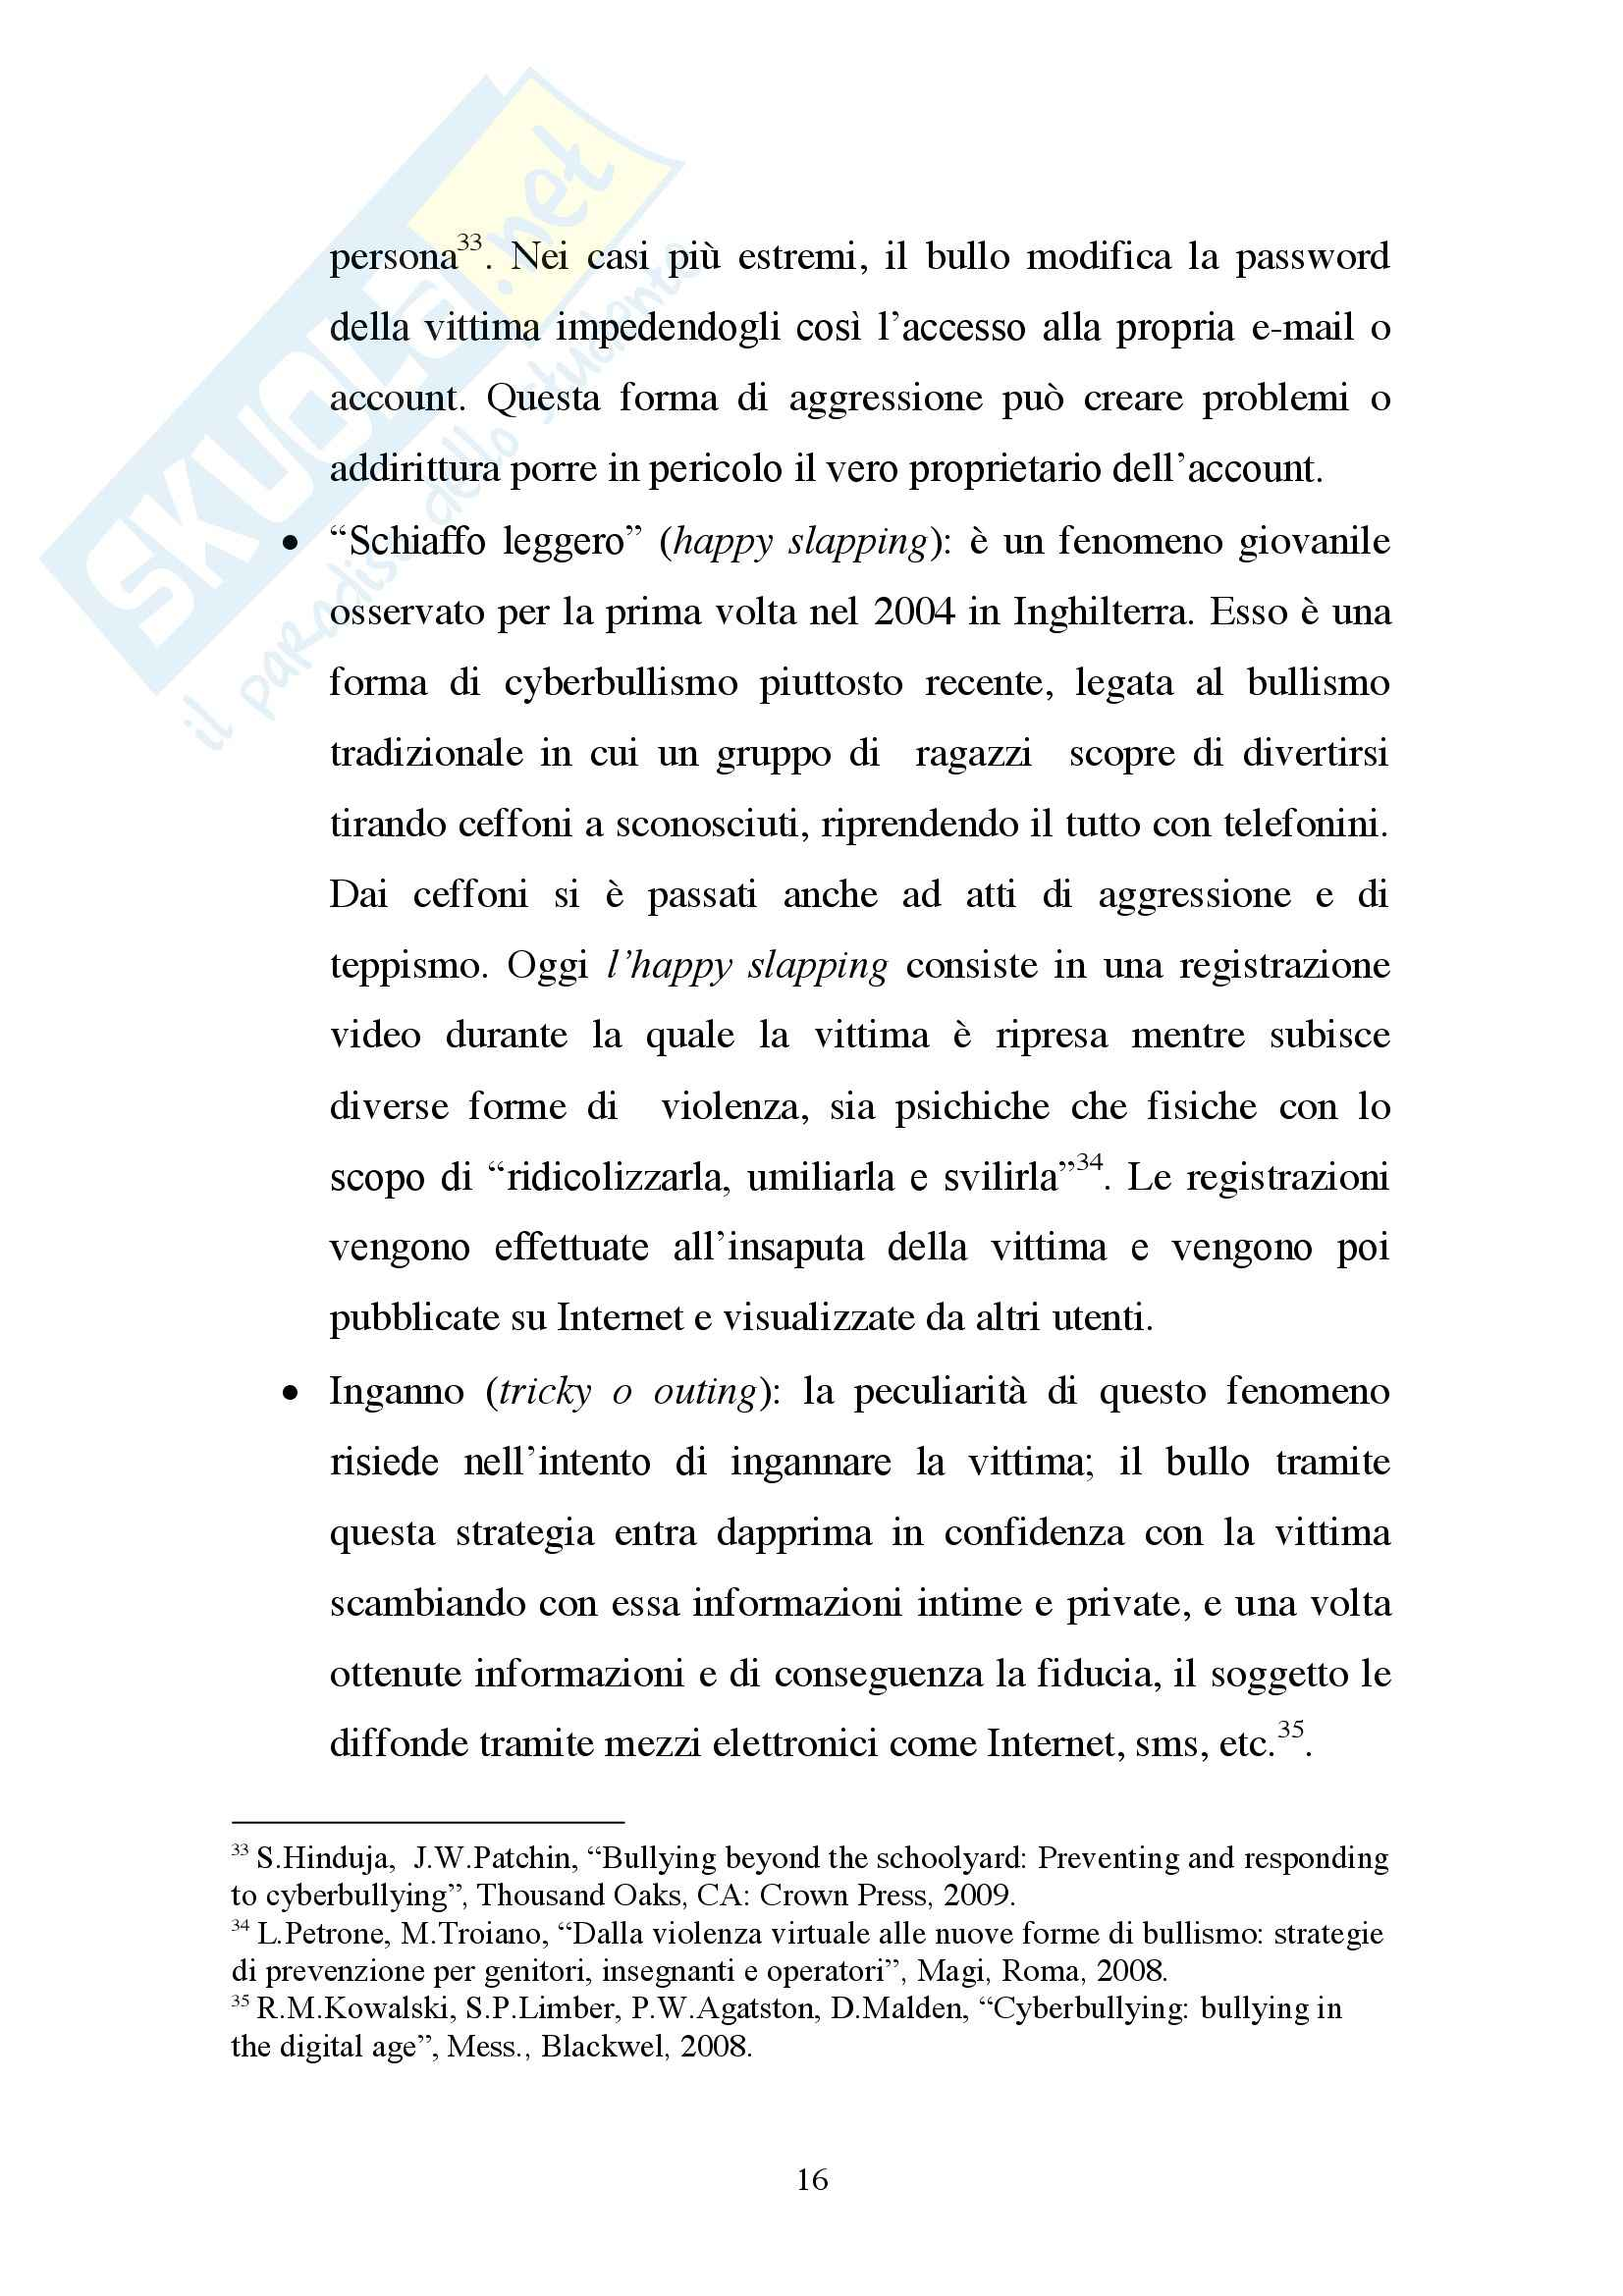 Cyberbullismo, Criminologia Pag. 16